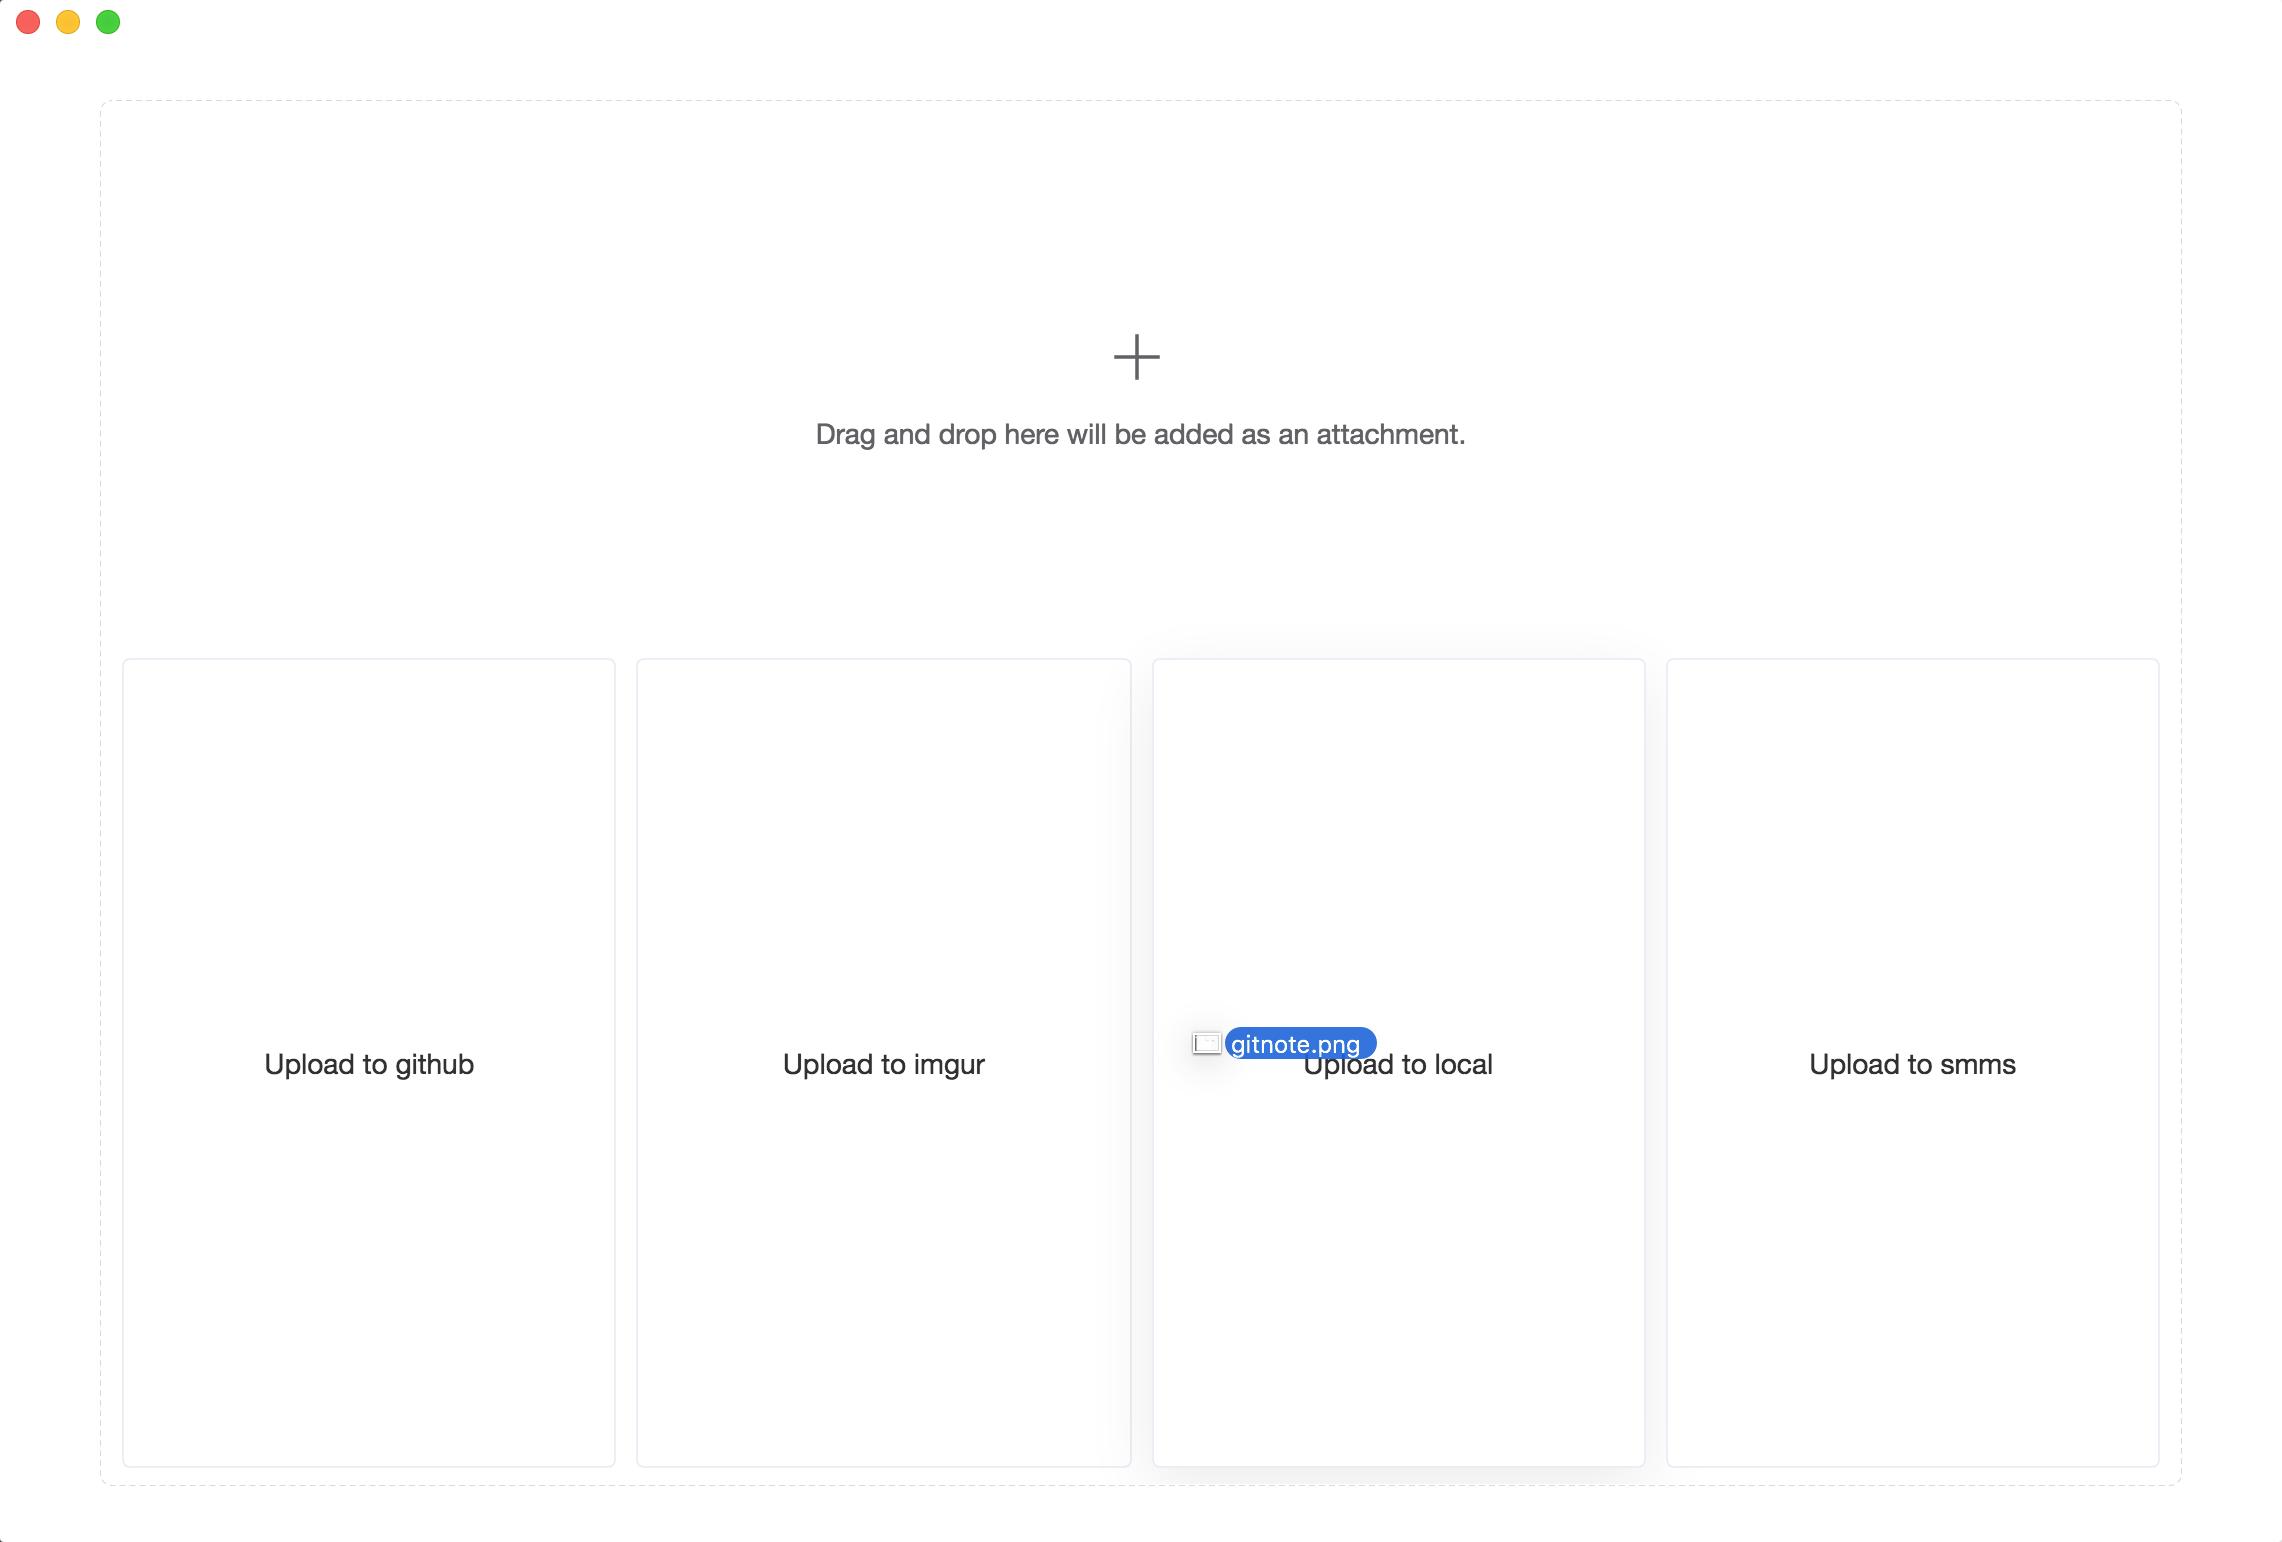 GitNote-基于Git的笔记软件